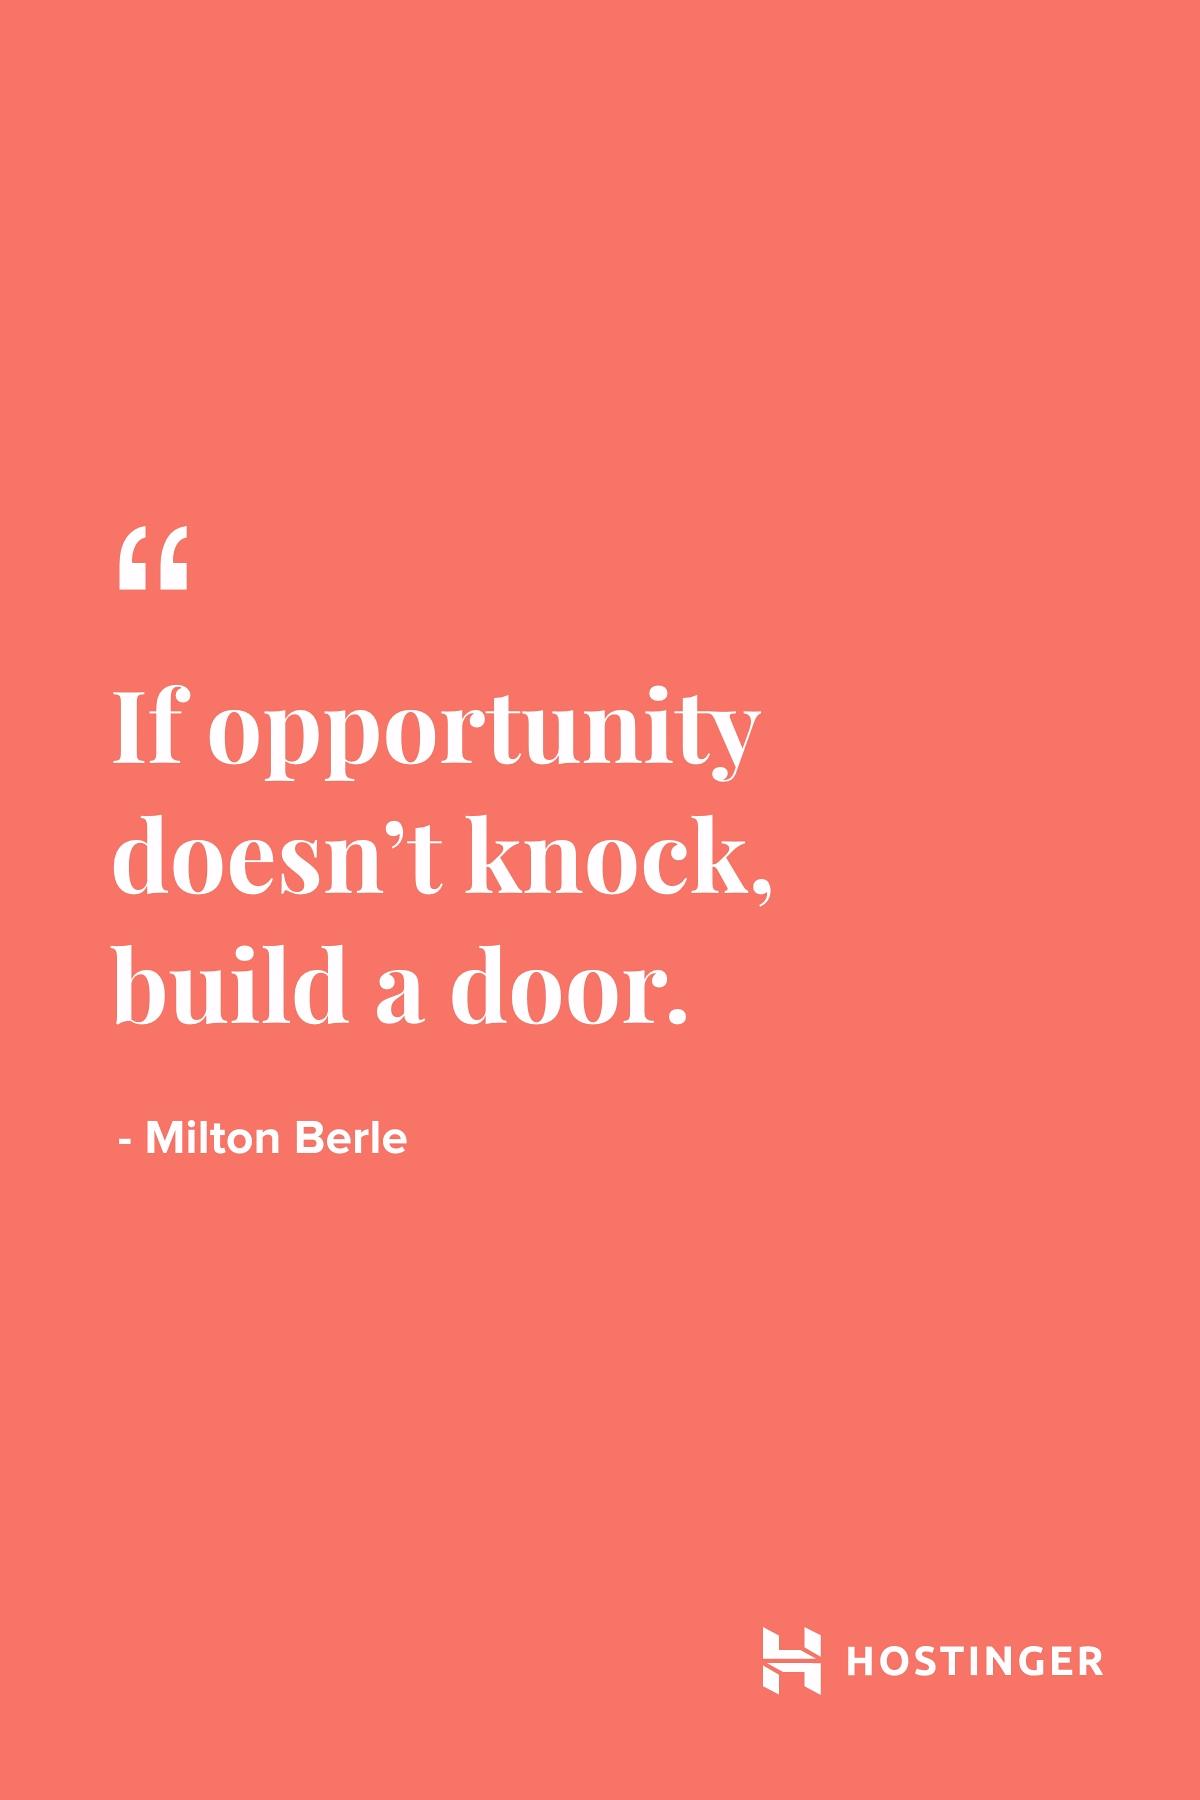 Quotes | Hostinger | Motivational | Milton Berle